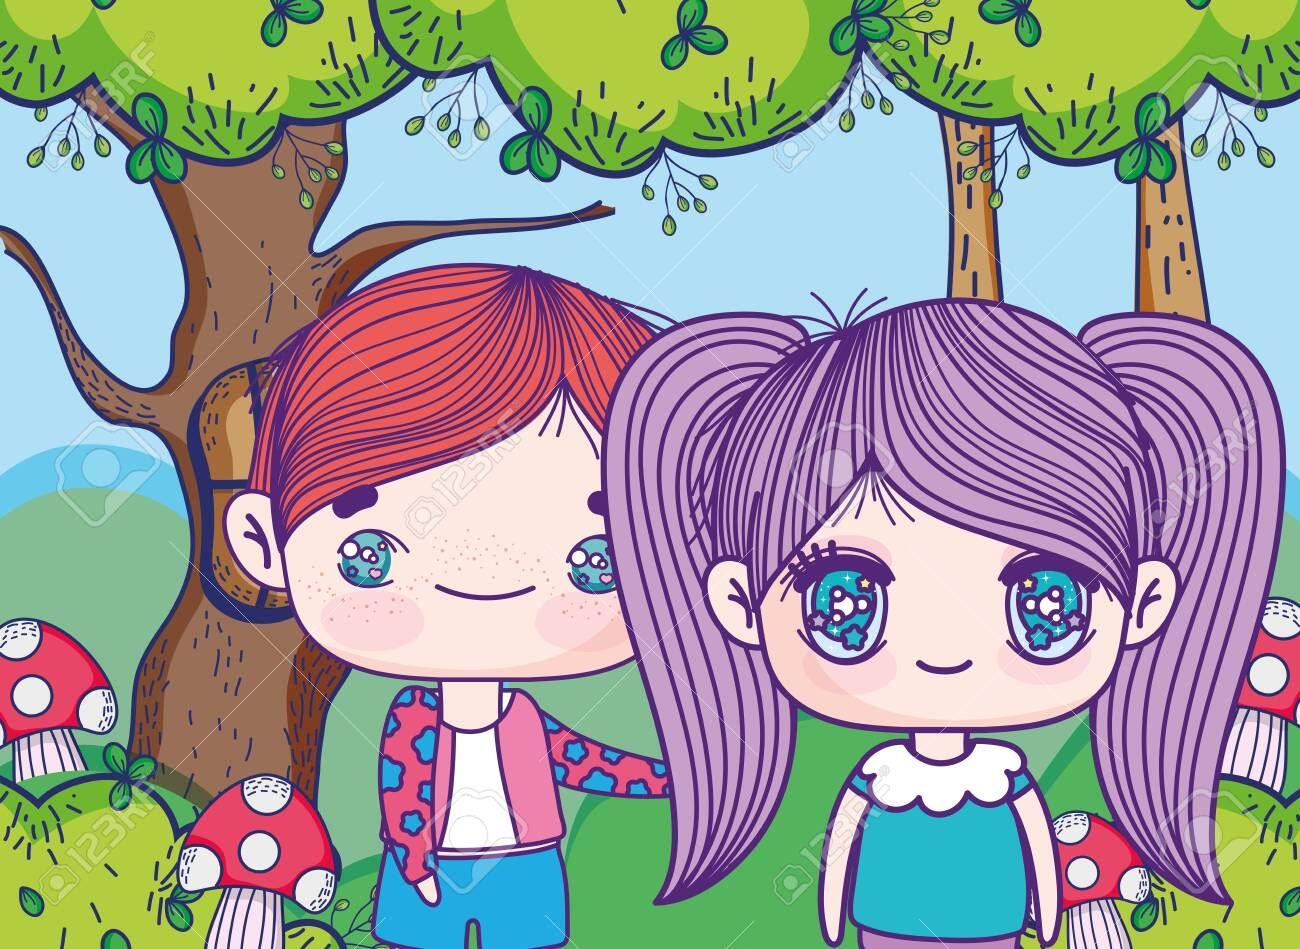 Kids Little Boy And Girl Anime Cartoon Forest Field Mushrooms Nature Vector Illustration Sponsored Affiliate Anime In 2020 Little Boy And Girl Anime Boy Or Girl